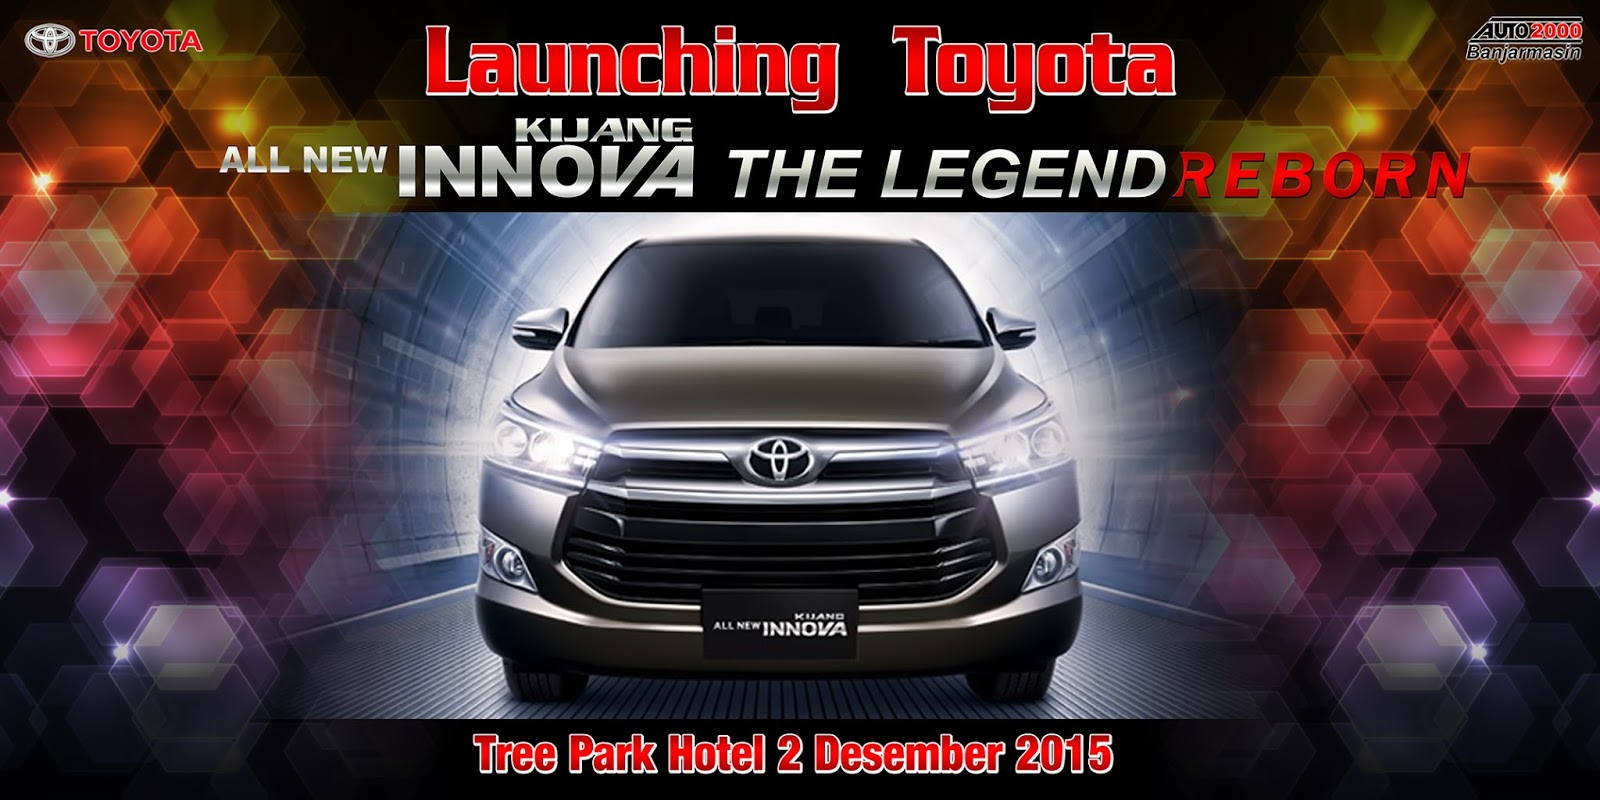 all new kijang innova reborn brand toyota camry for sale auto2000 banjarmasin 11 29 15